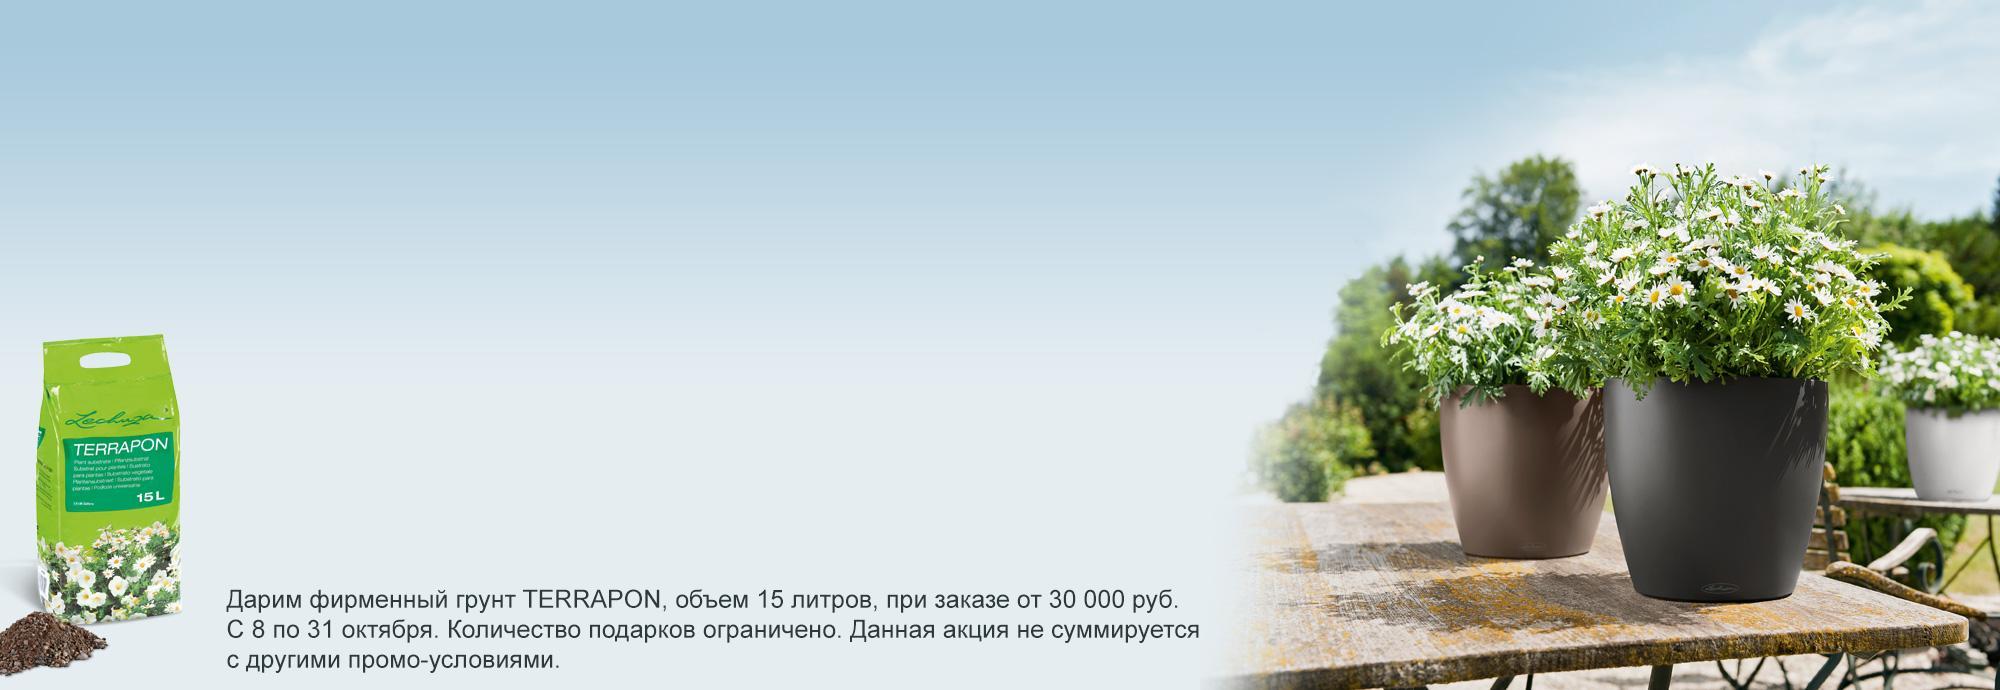 hero_banner_promo_terrapon_181004_ru